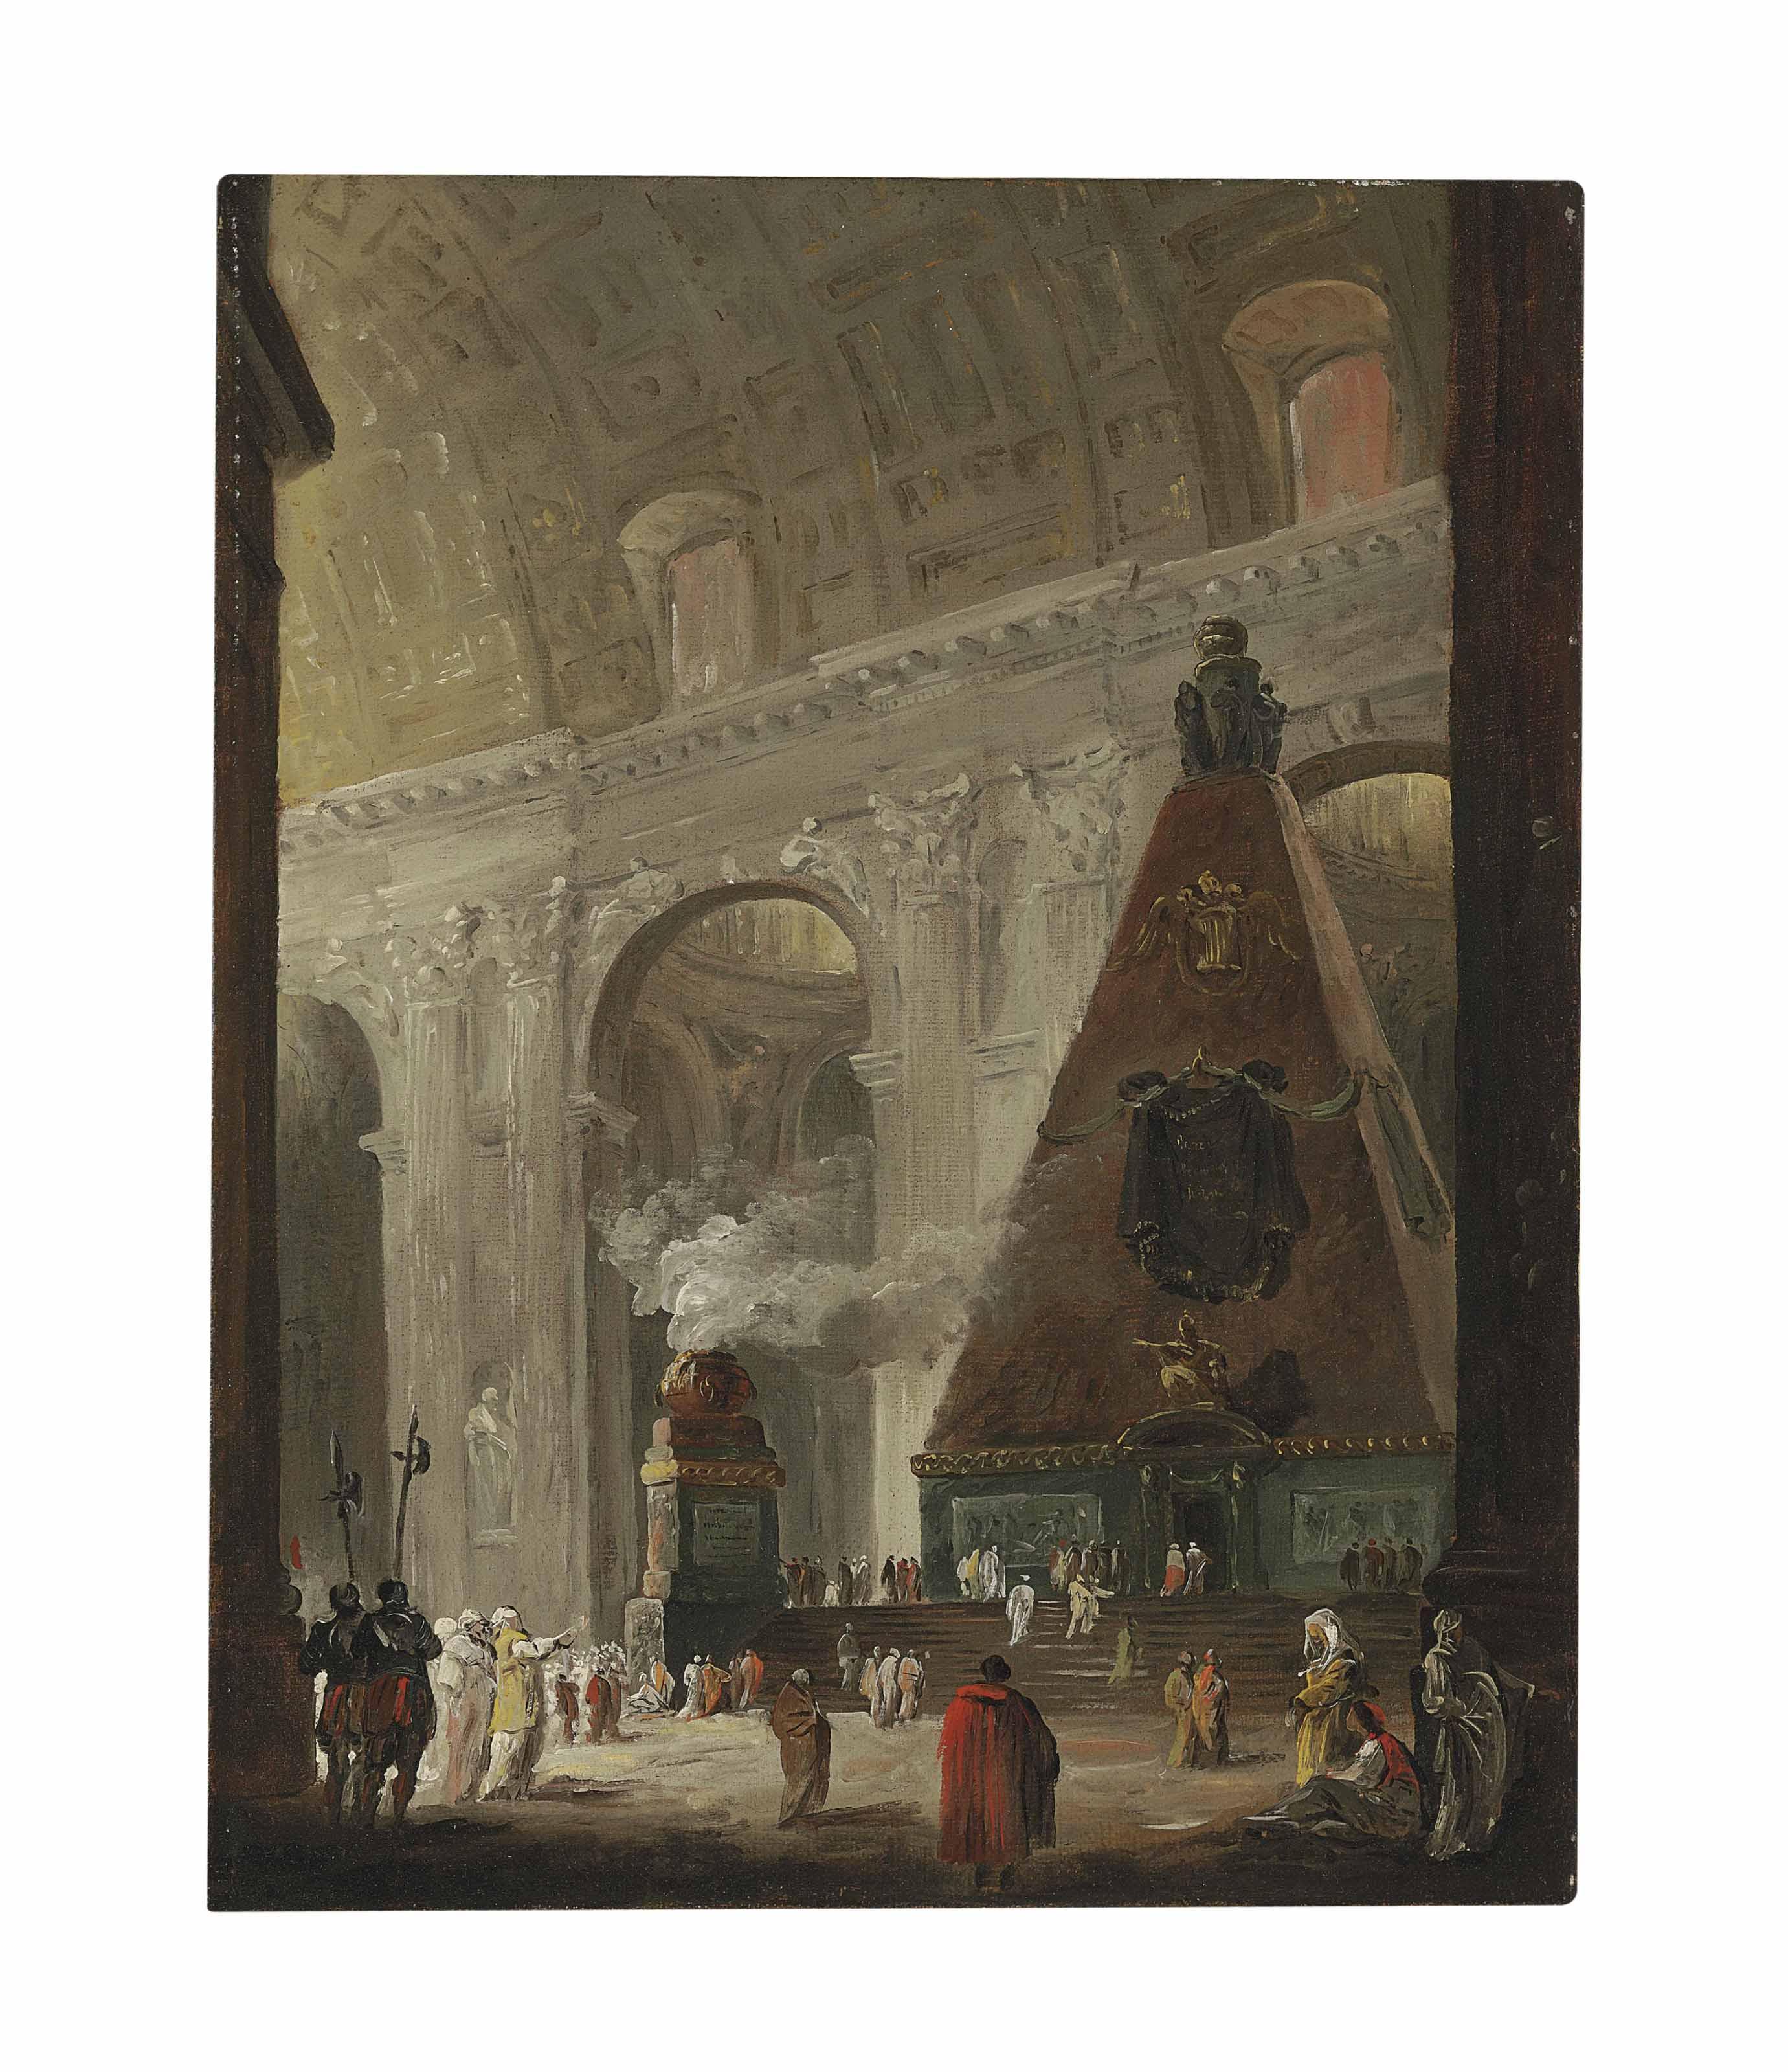 The catafalque of Pope Benedict XIV in Saint Peter's, Rome